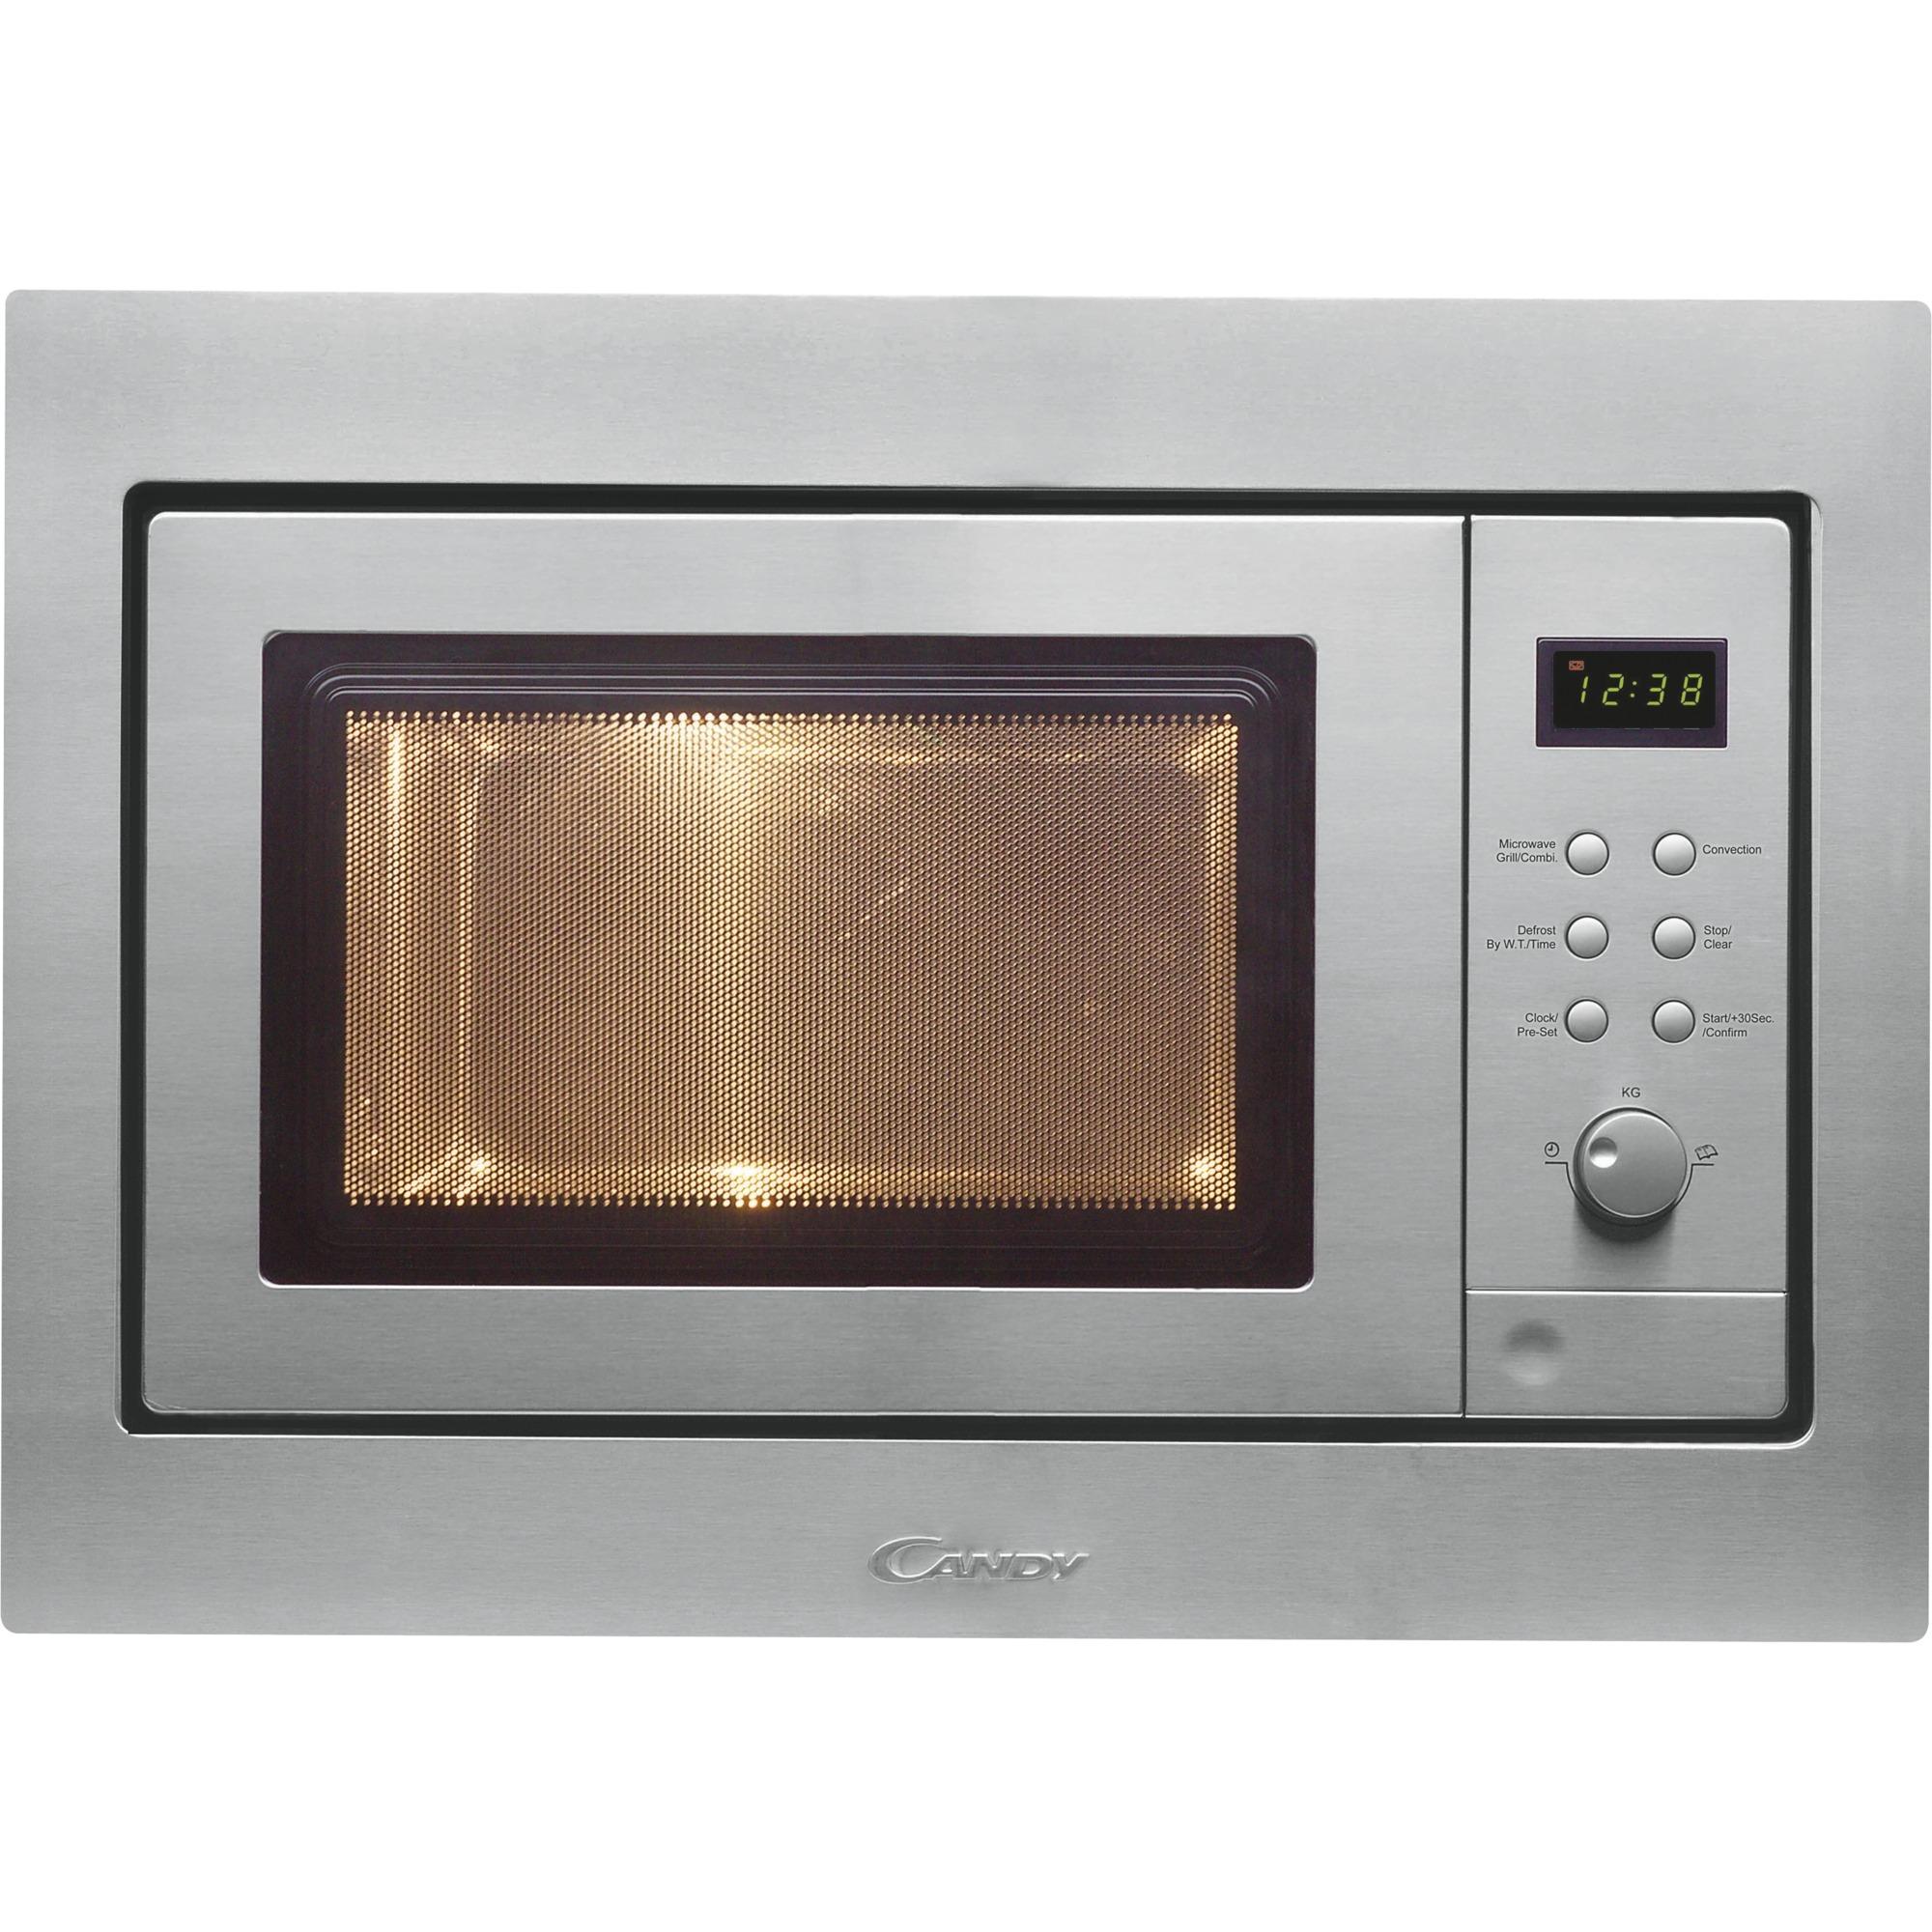 MIC 256 EX 25L 1400W Acier inoxydable, Four à micro-ondes